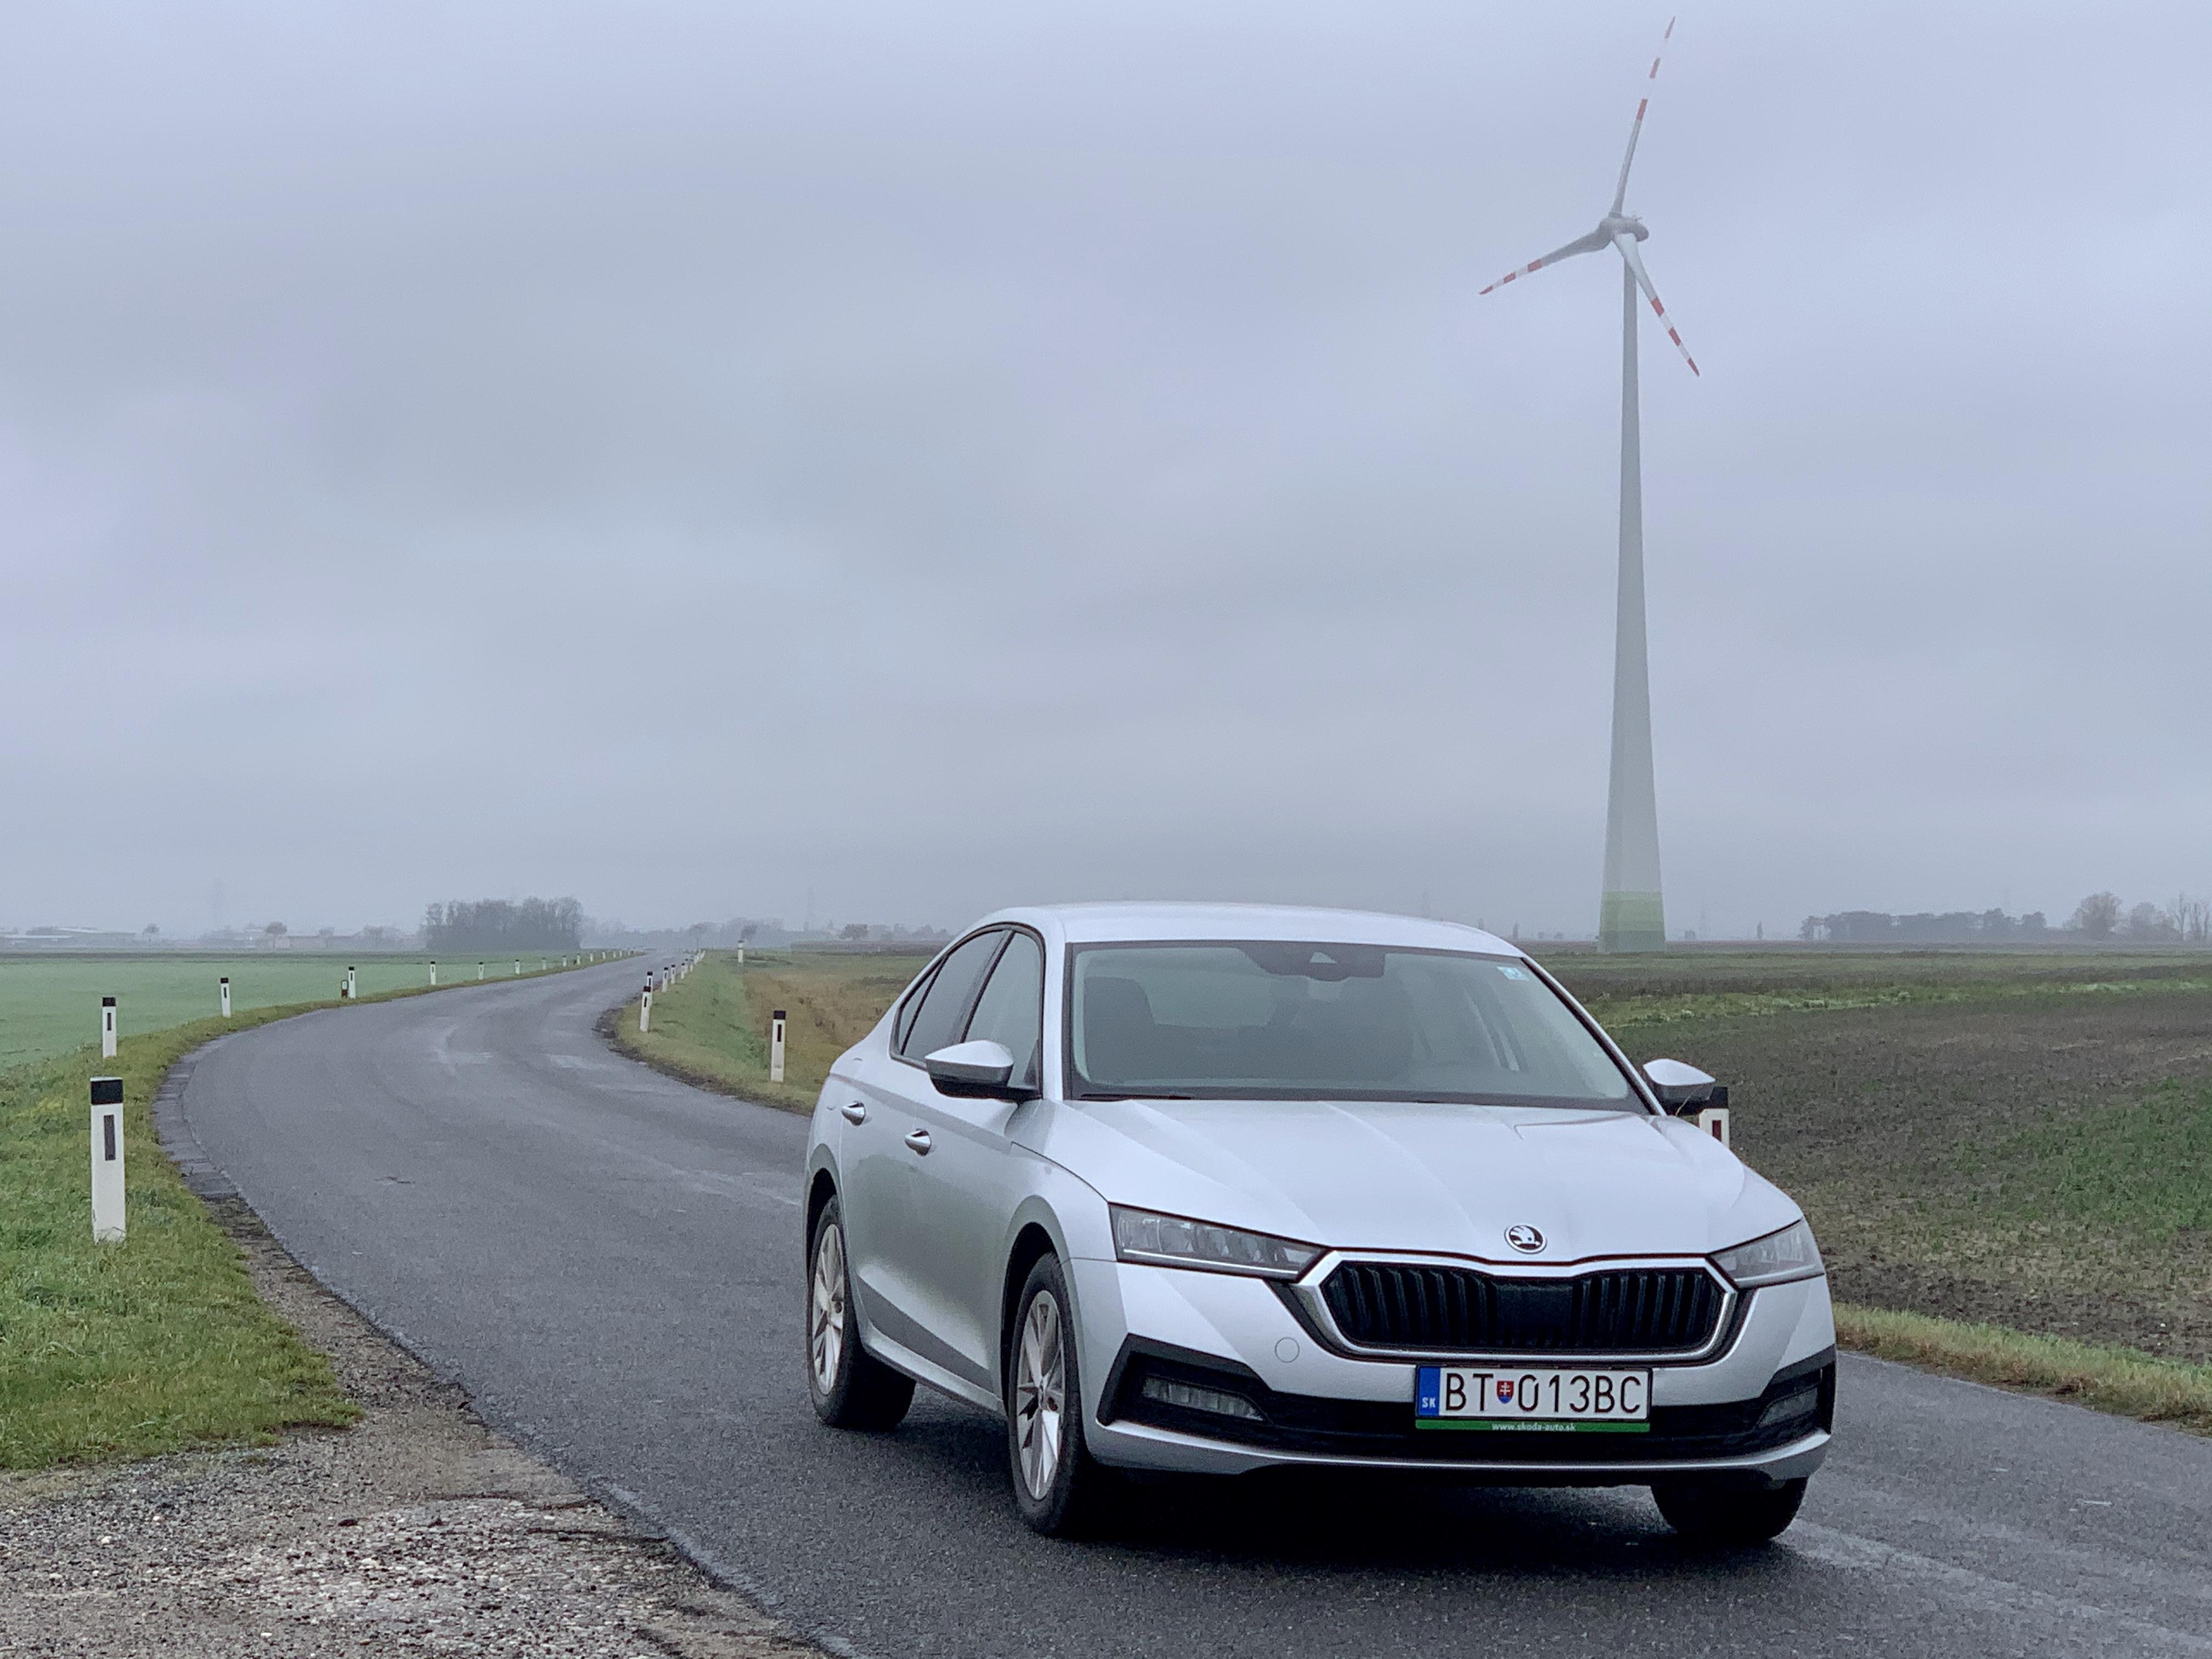 Škoda Octavia 2.0 TDI 85kW